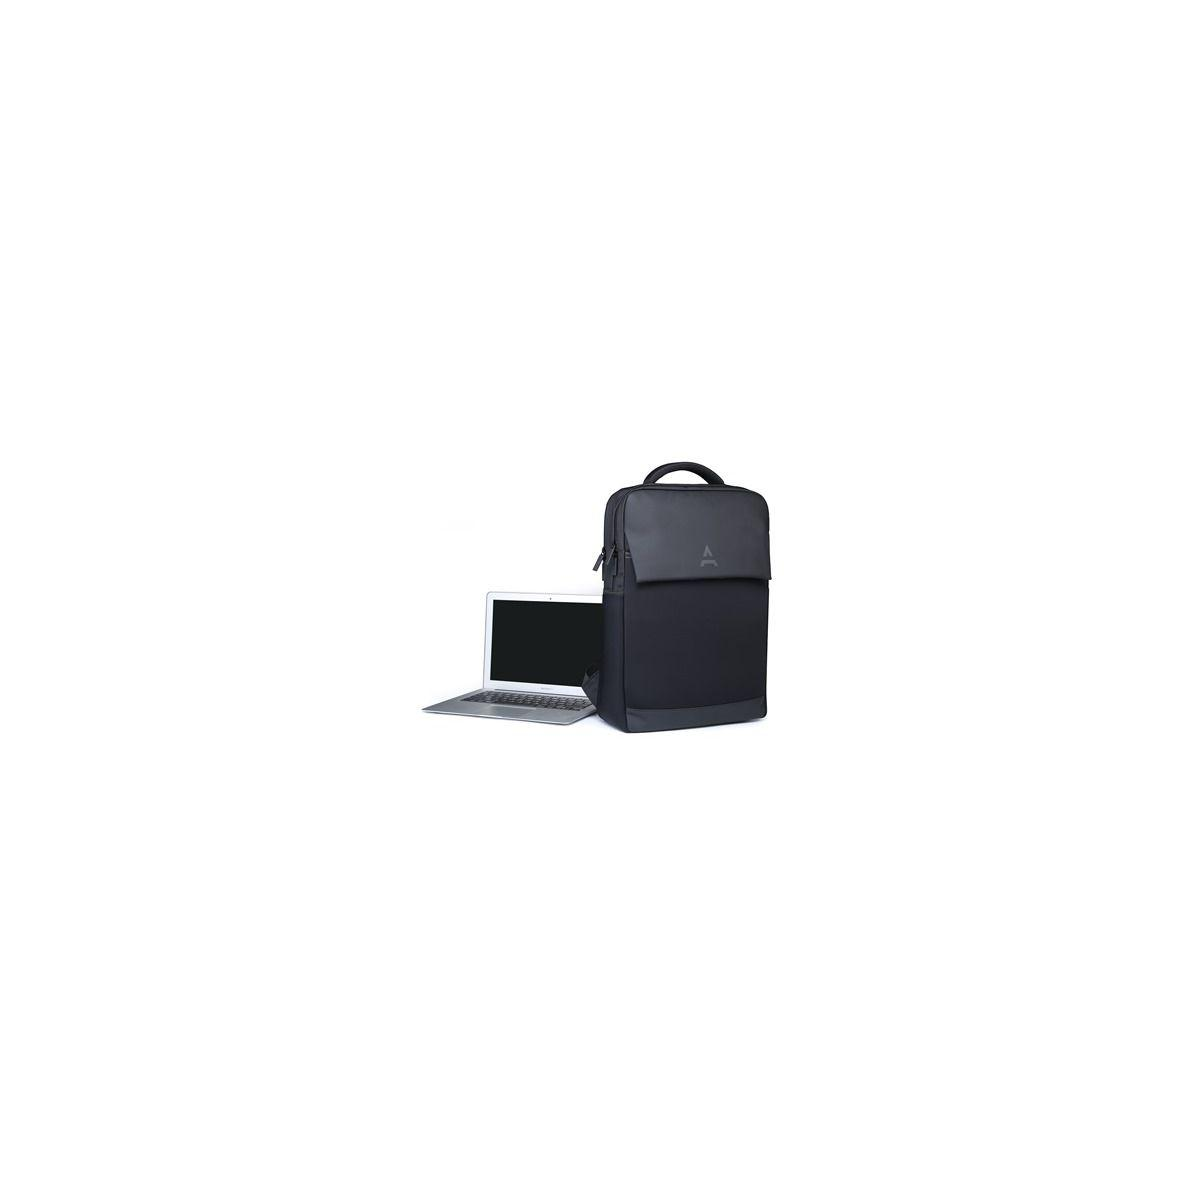 Sac � dos adeqwat sporty 13-16'' noir - livraison offerte : code premium